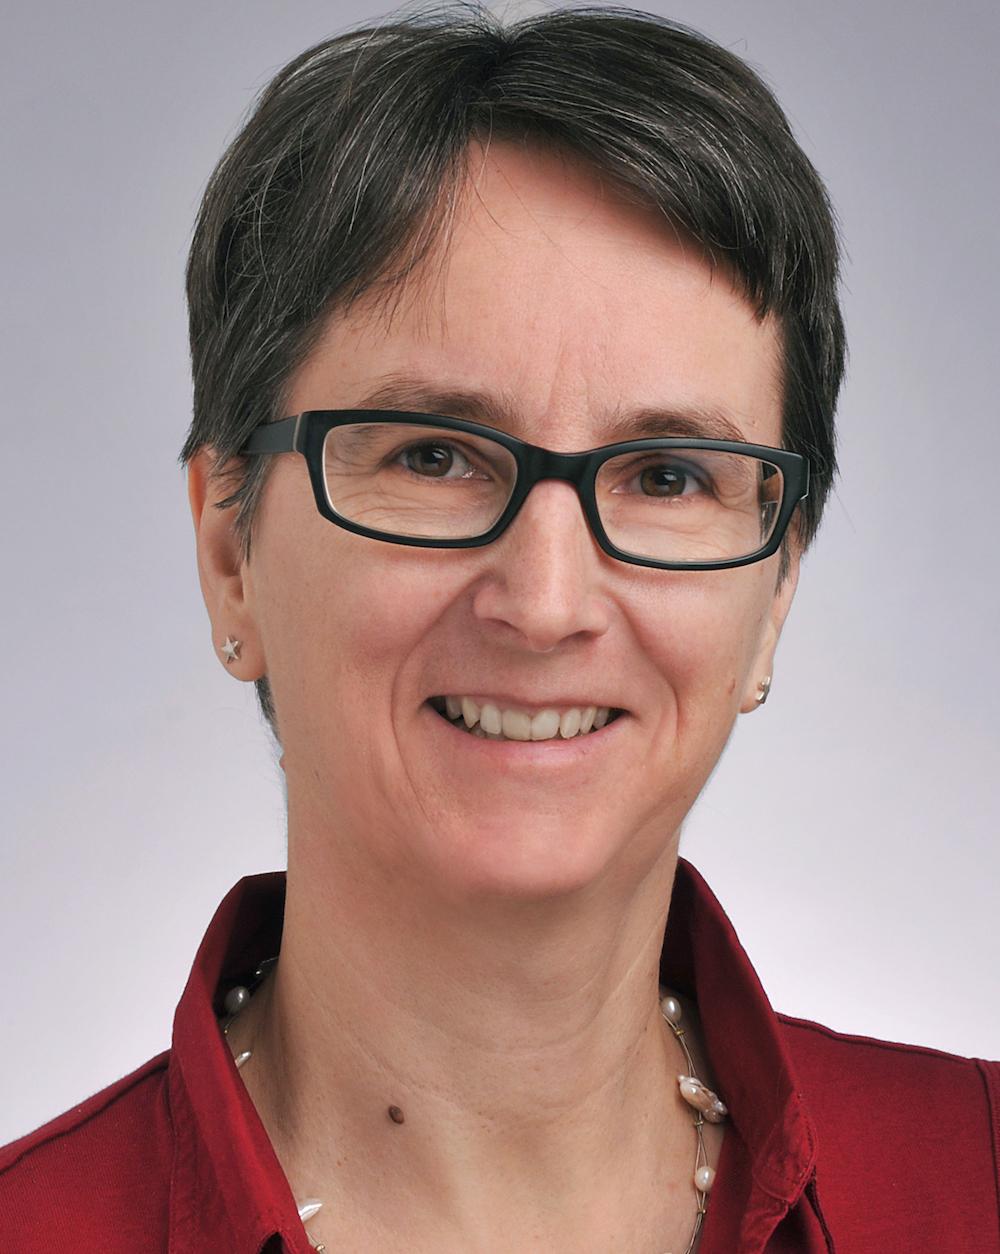 Dr. Angela Büchel